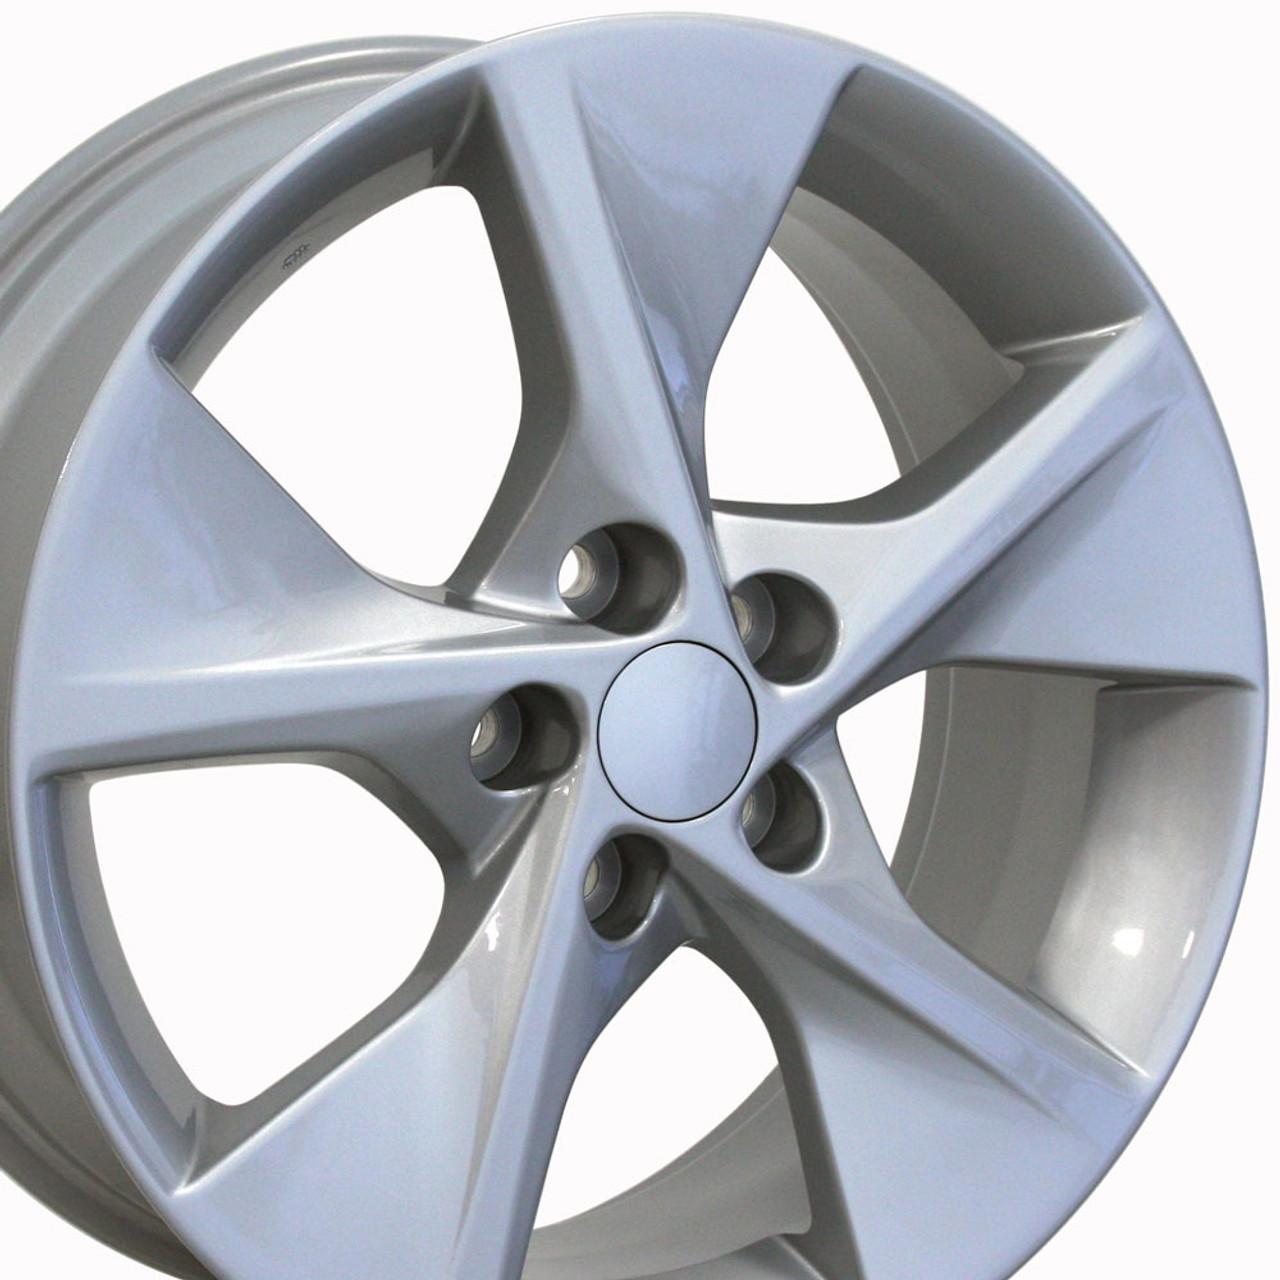 wheels cover paseo set black toyota amazon dp ice com r drive automotive accessories of replica wheel kt